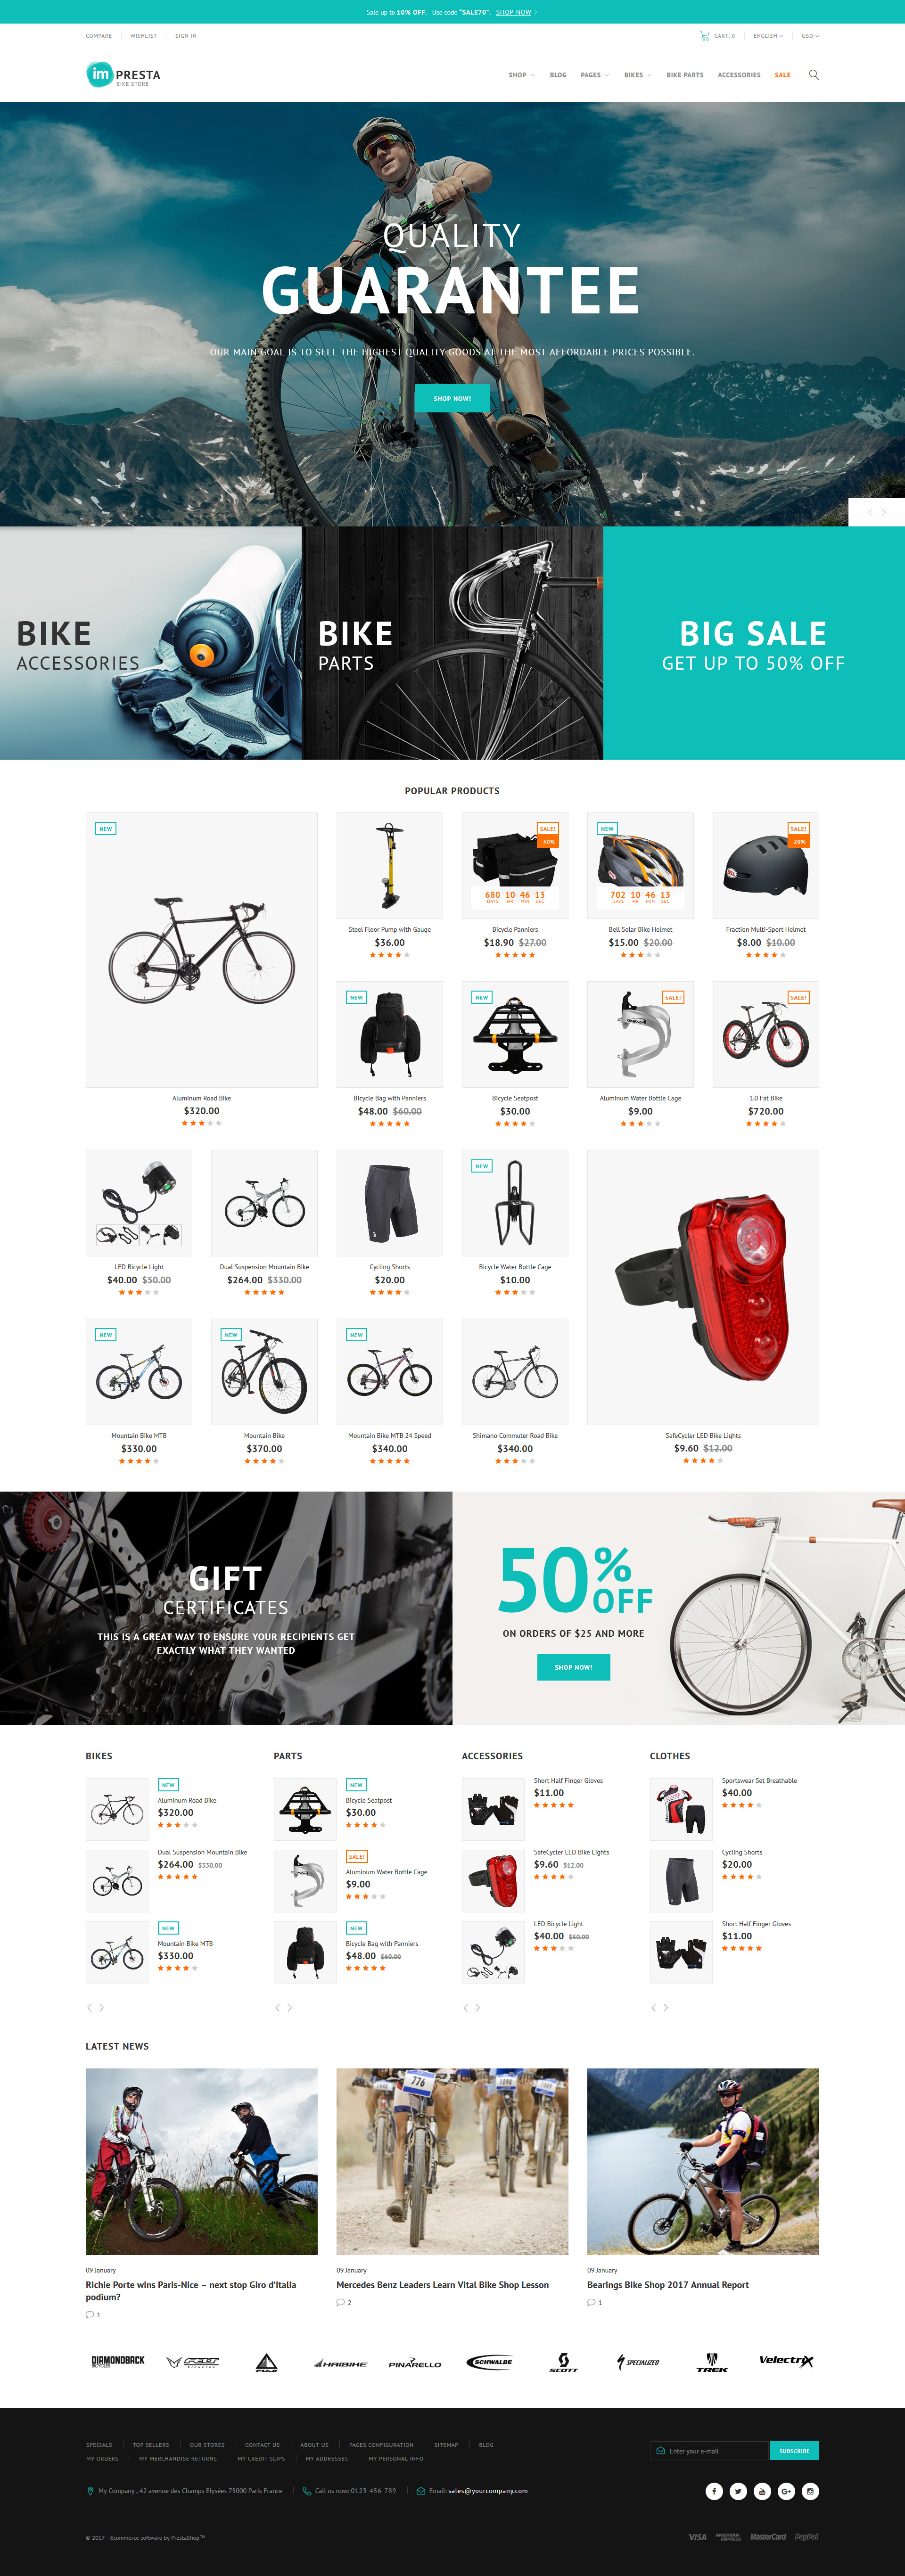 Impresta - Bike Store PrestaShop Theme